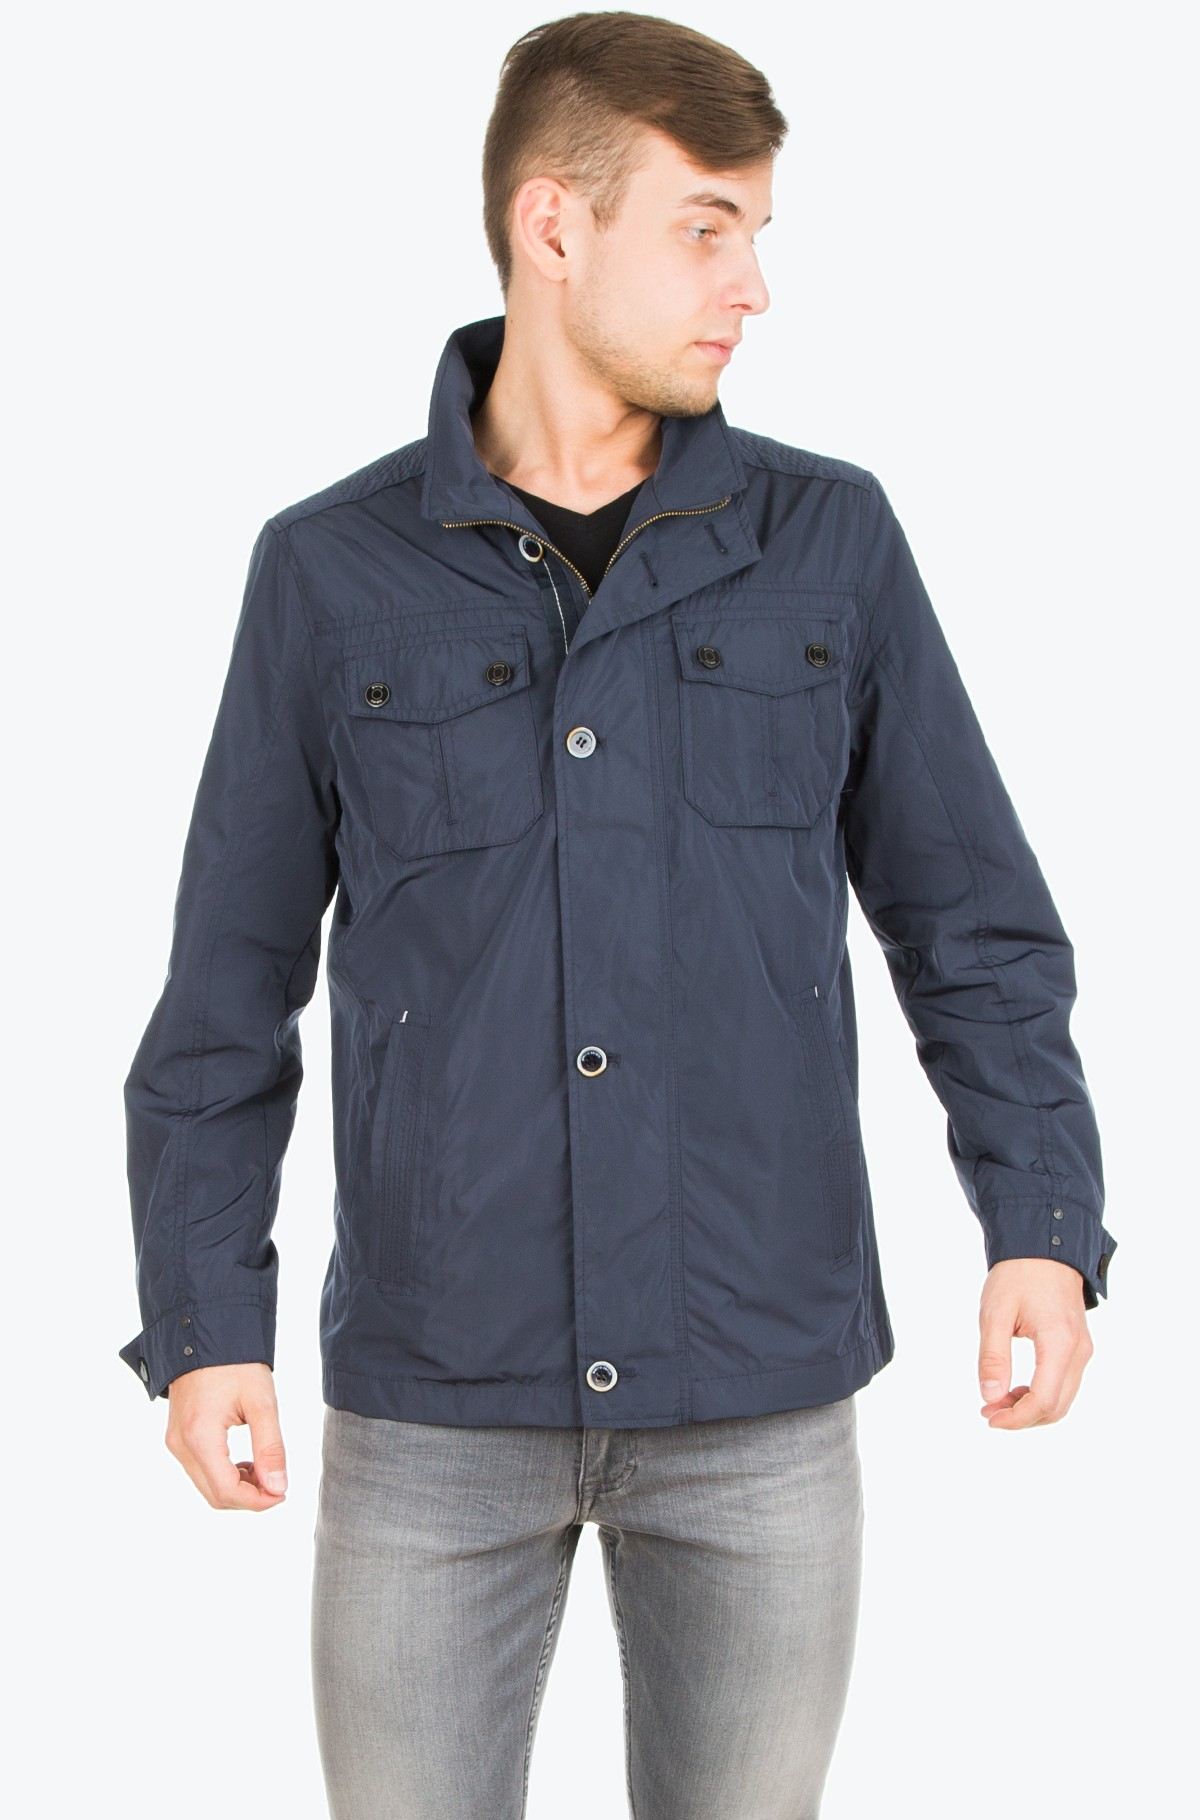 Jacket 64040-3664-full-1